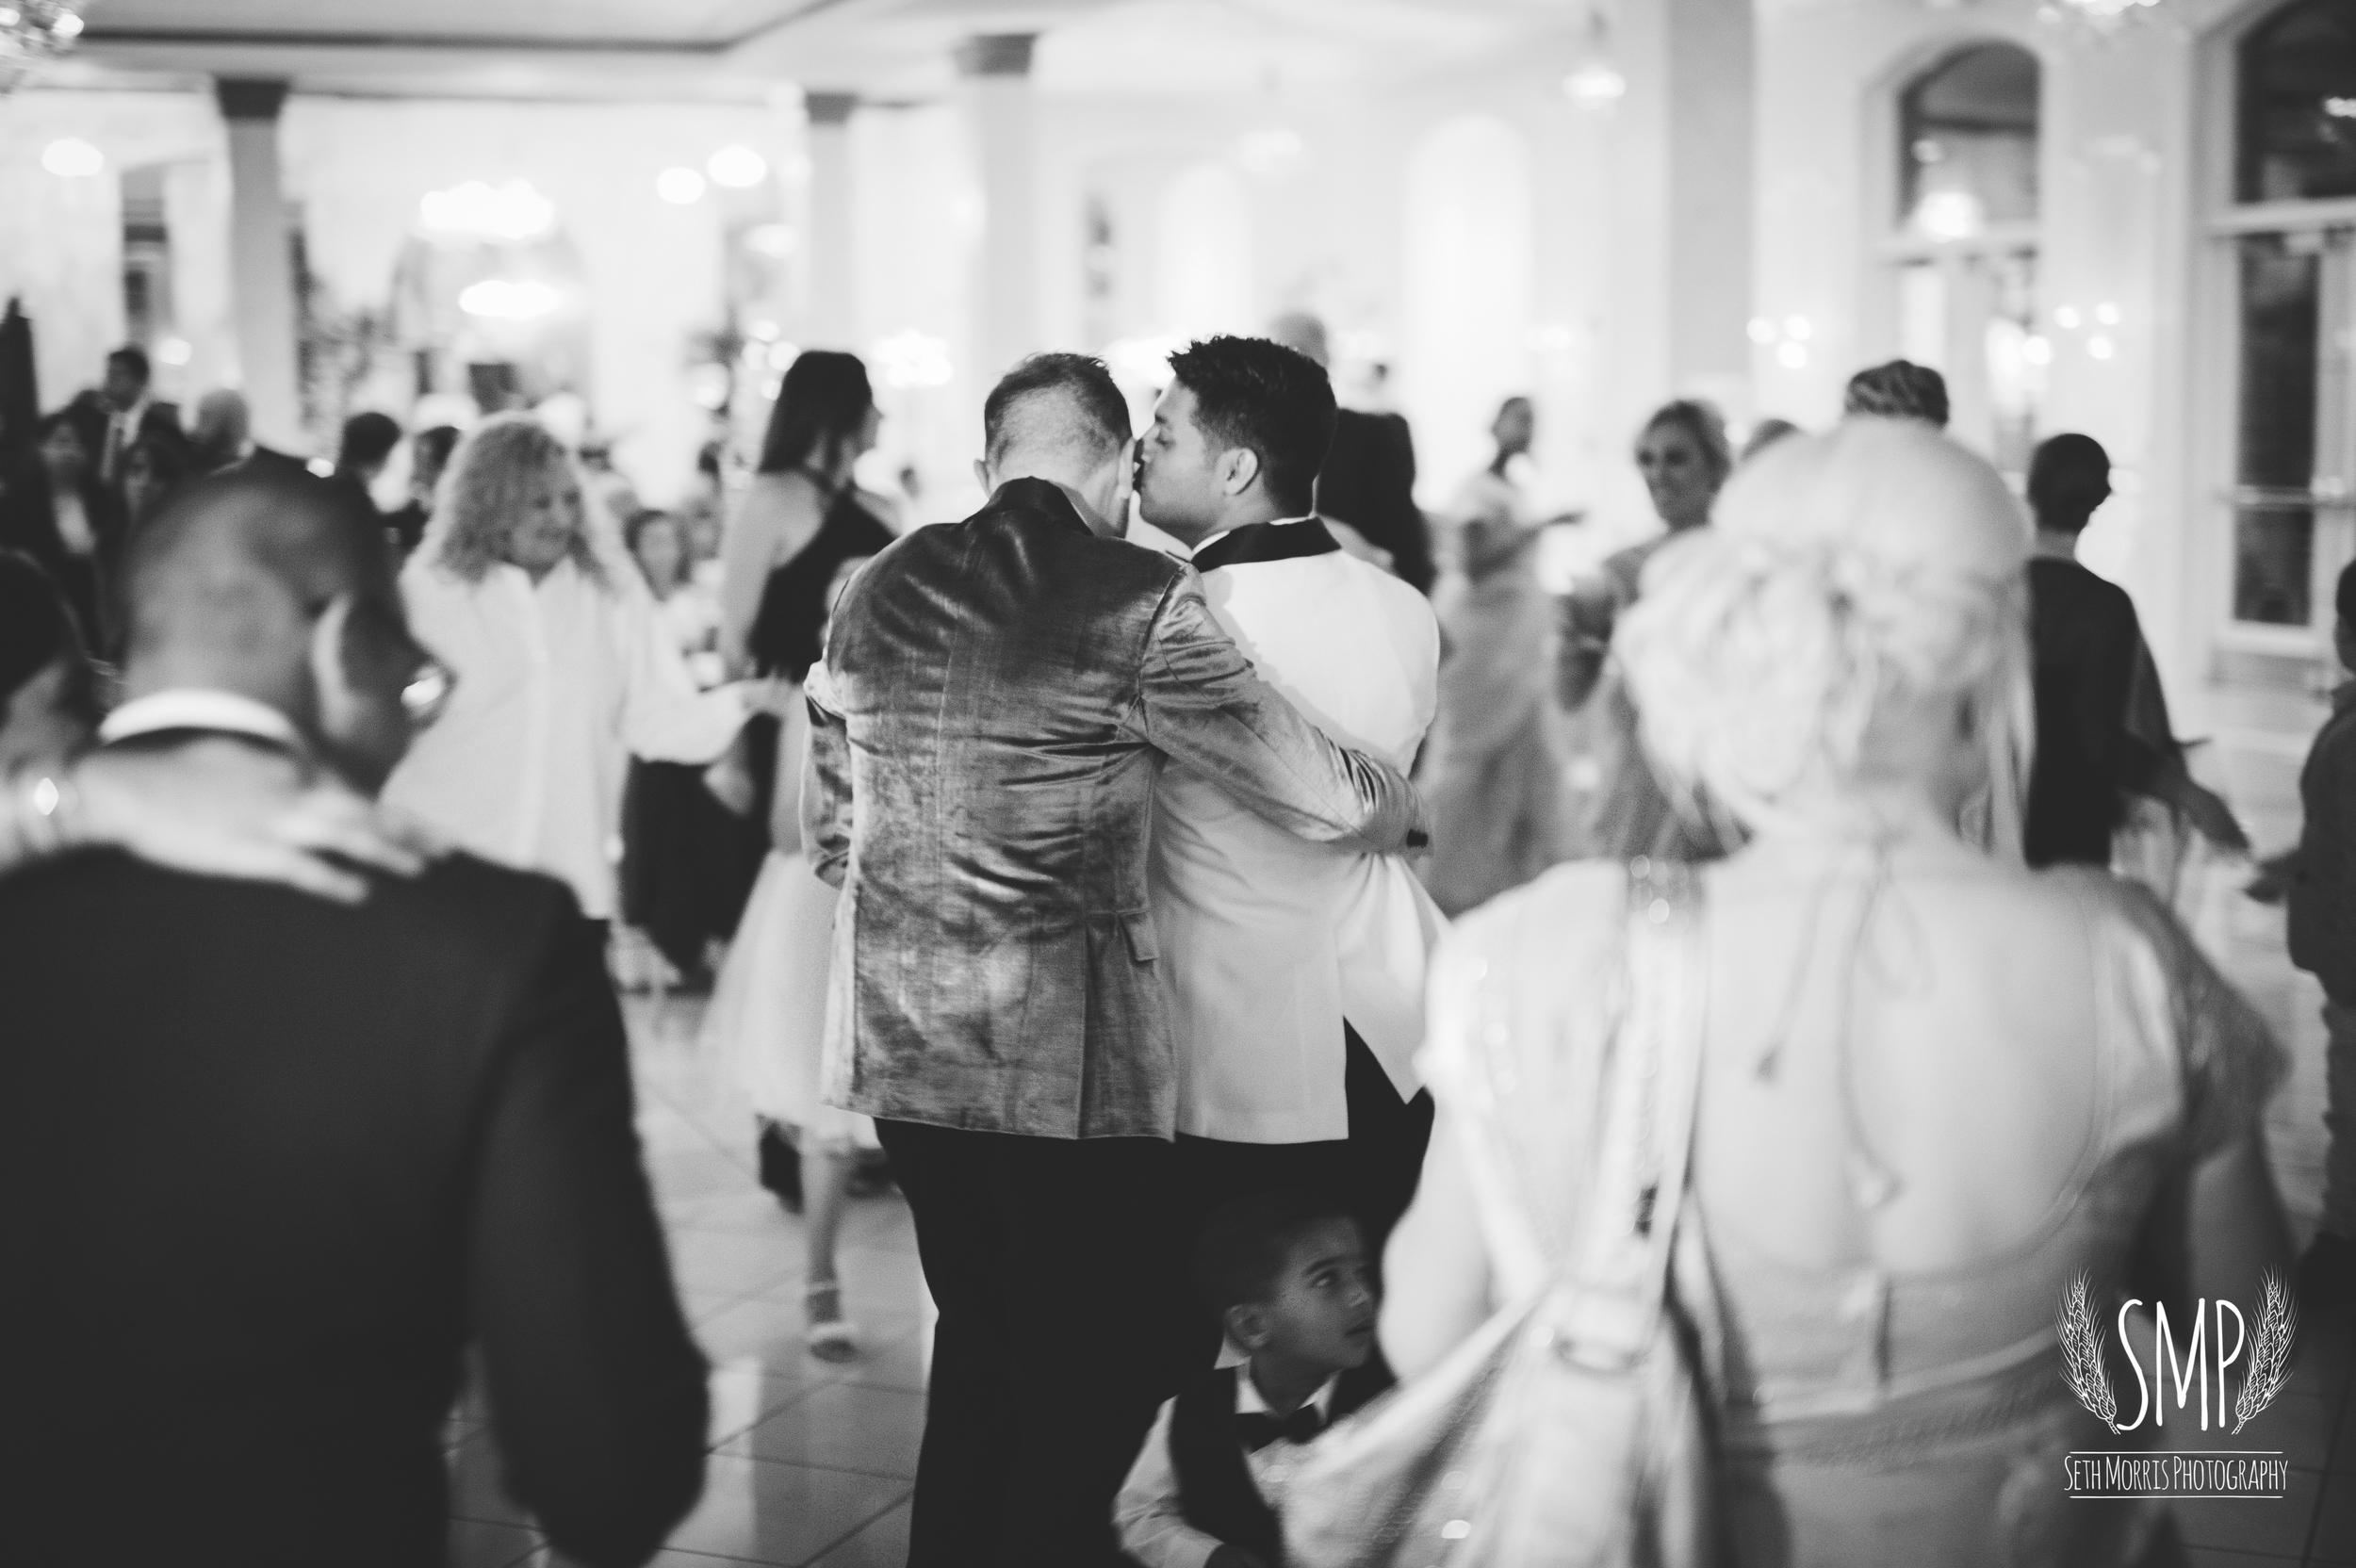 same-sex-wedding-photographer-chicago-illinois-125.jpg